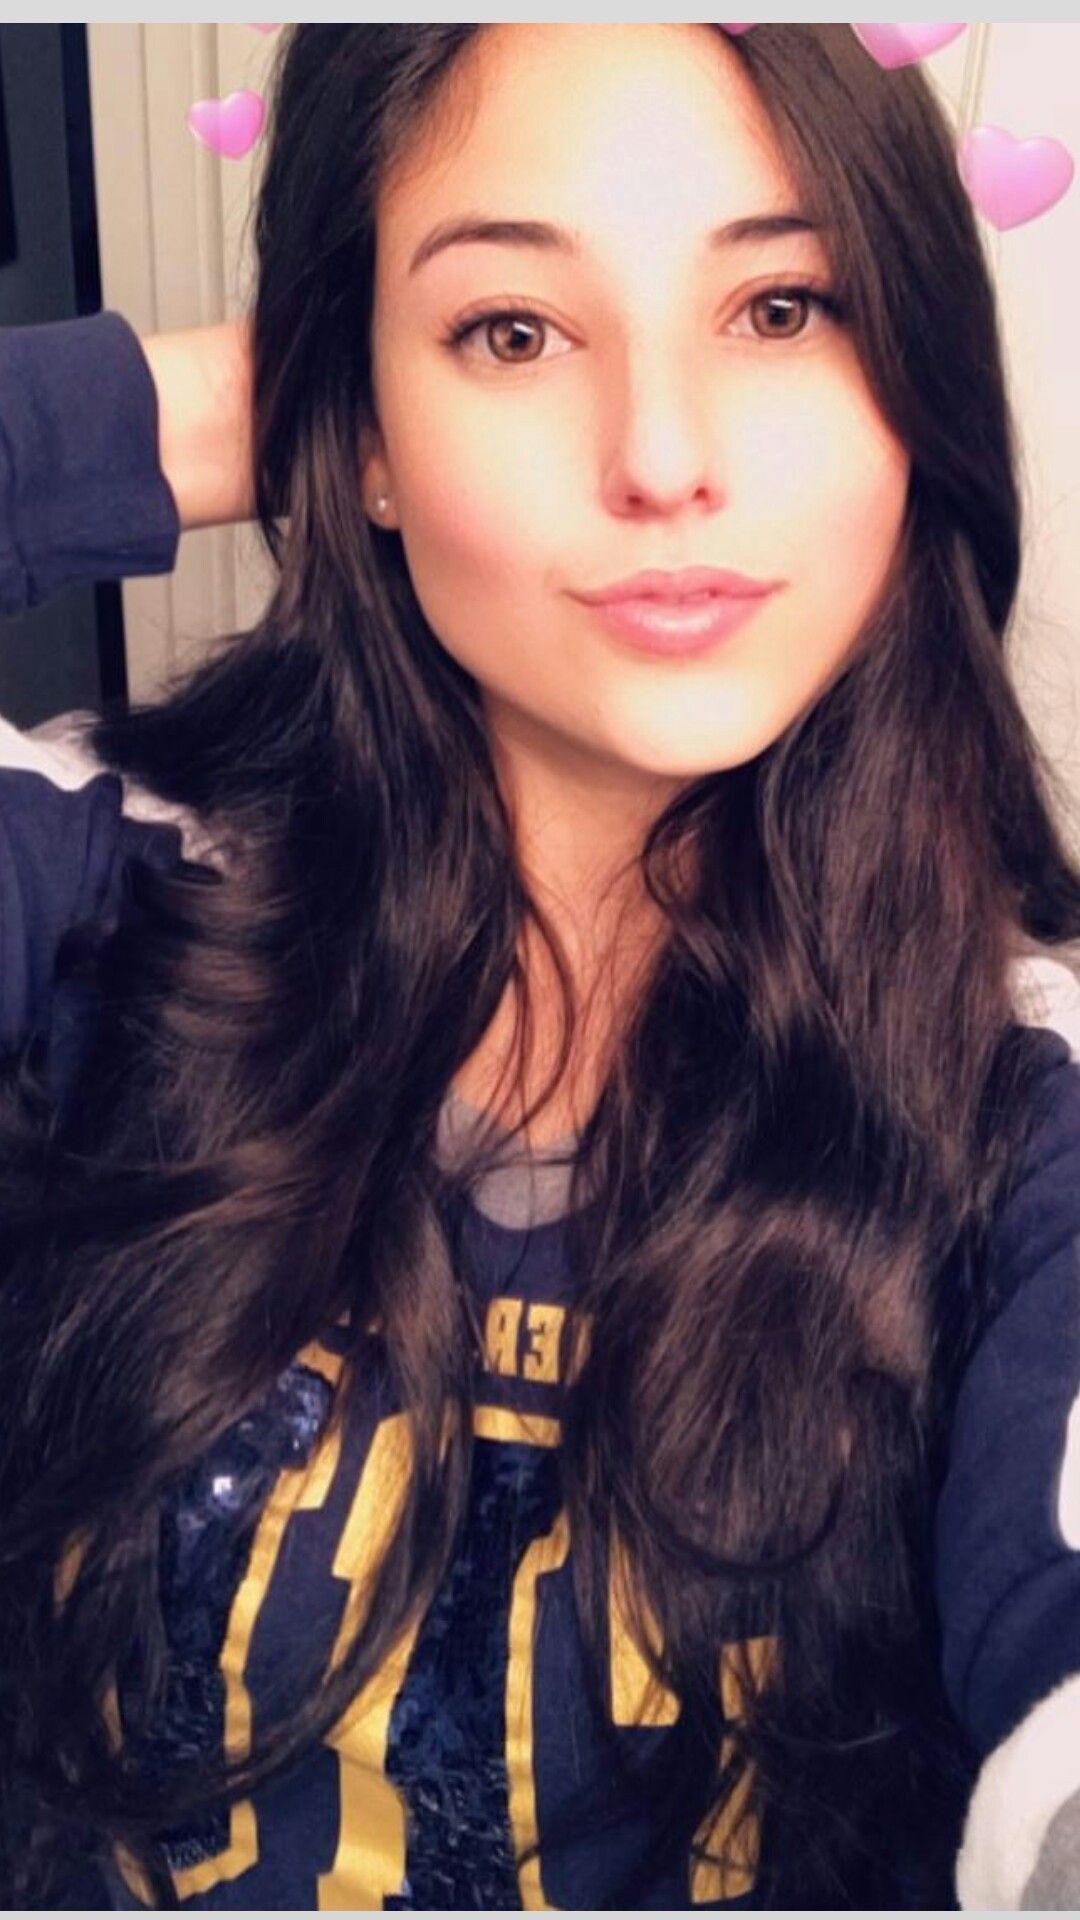 Selfie Angeline Varona nudes (15 foto and video), Tits, Paparazzi, Boobs, bra 2018